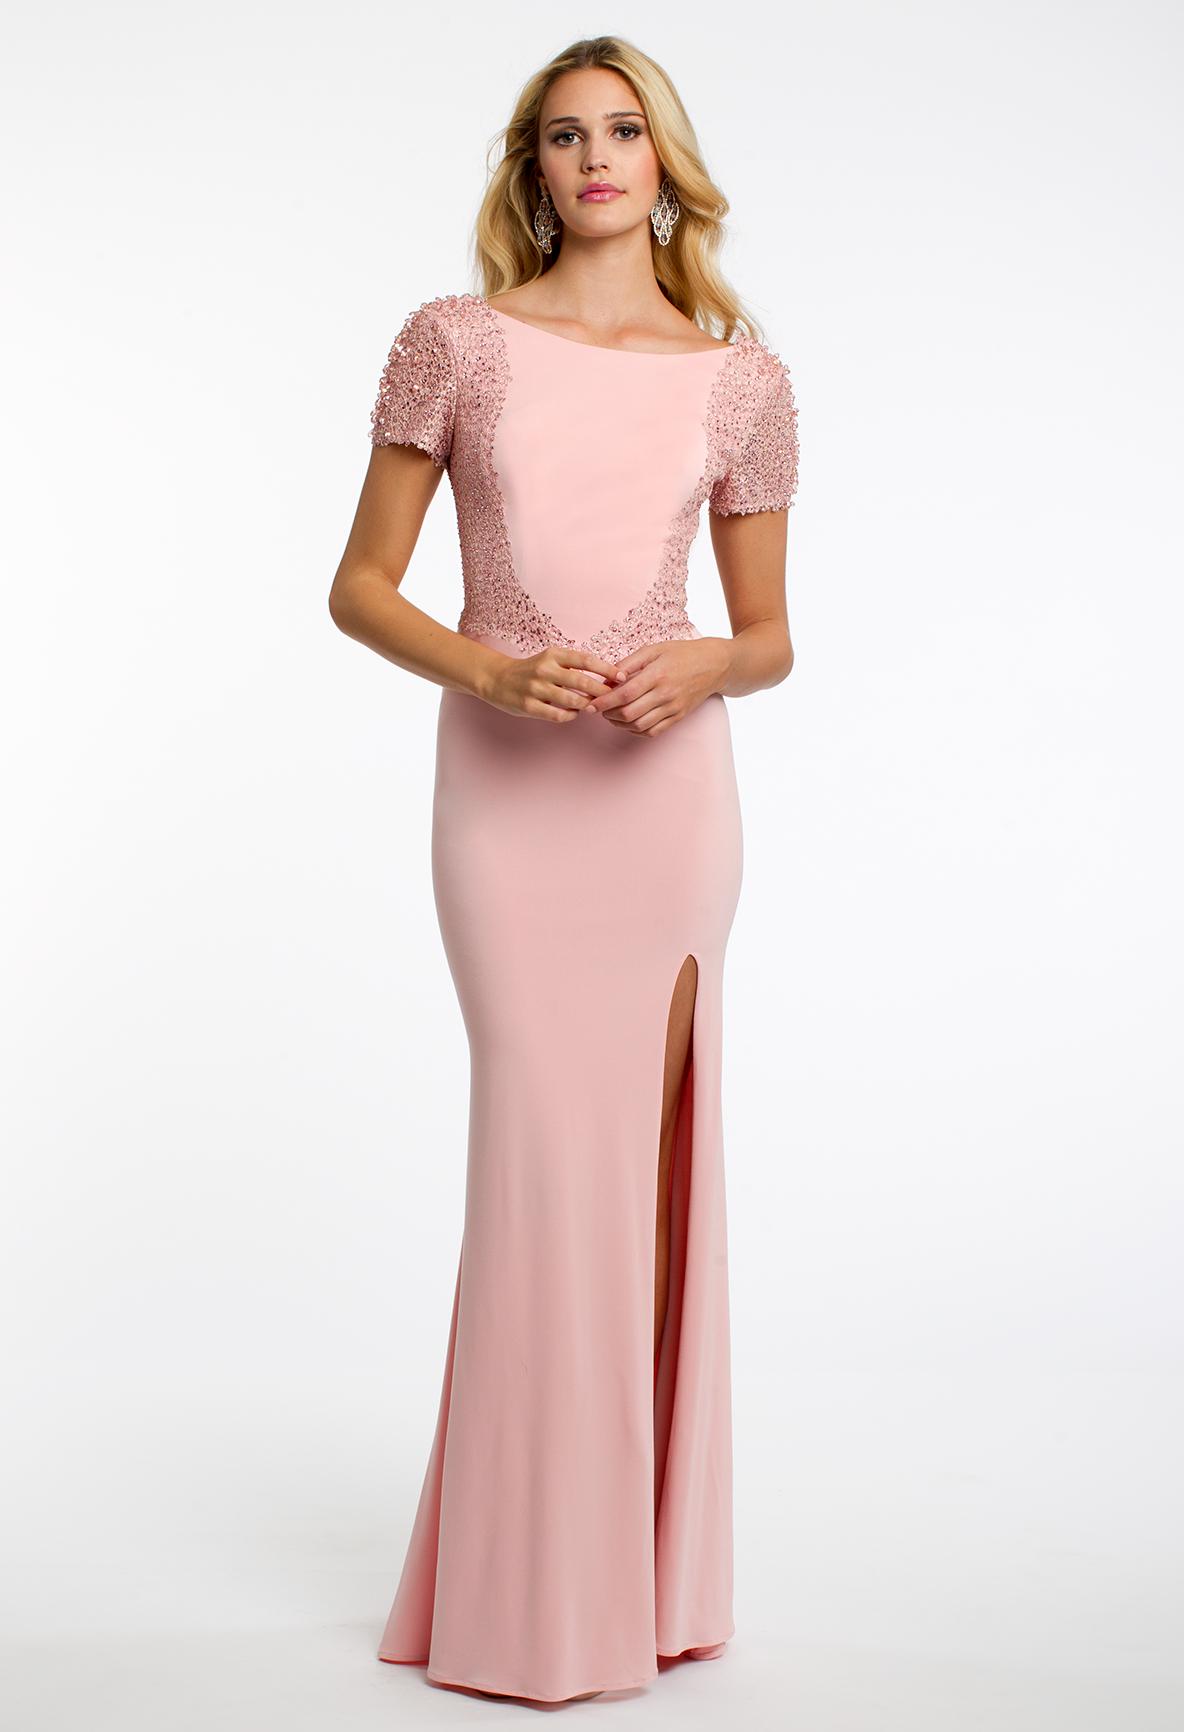 Short Sleeve Embroidered Crystal Dress #camillelavie | PROM DRESSES ...